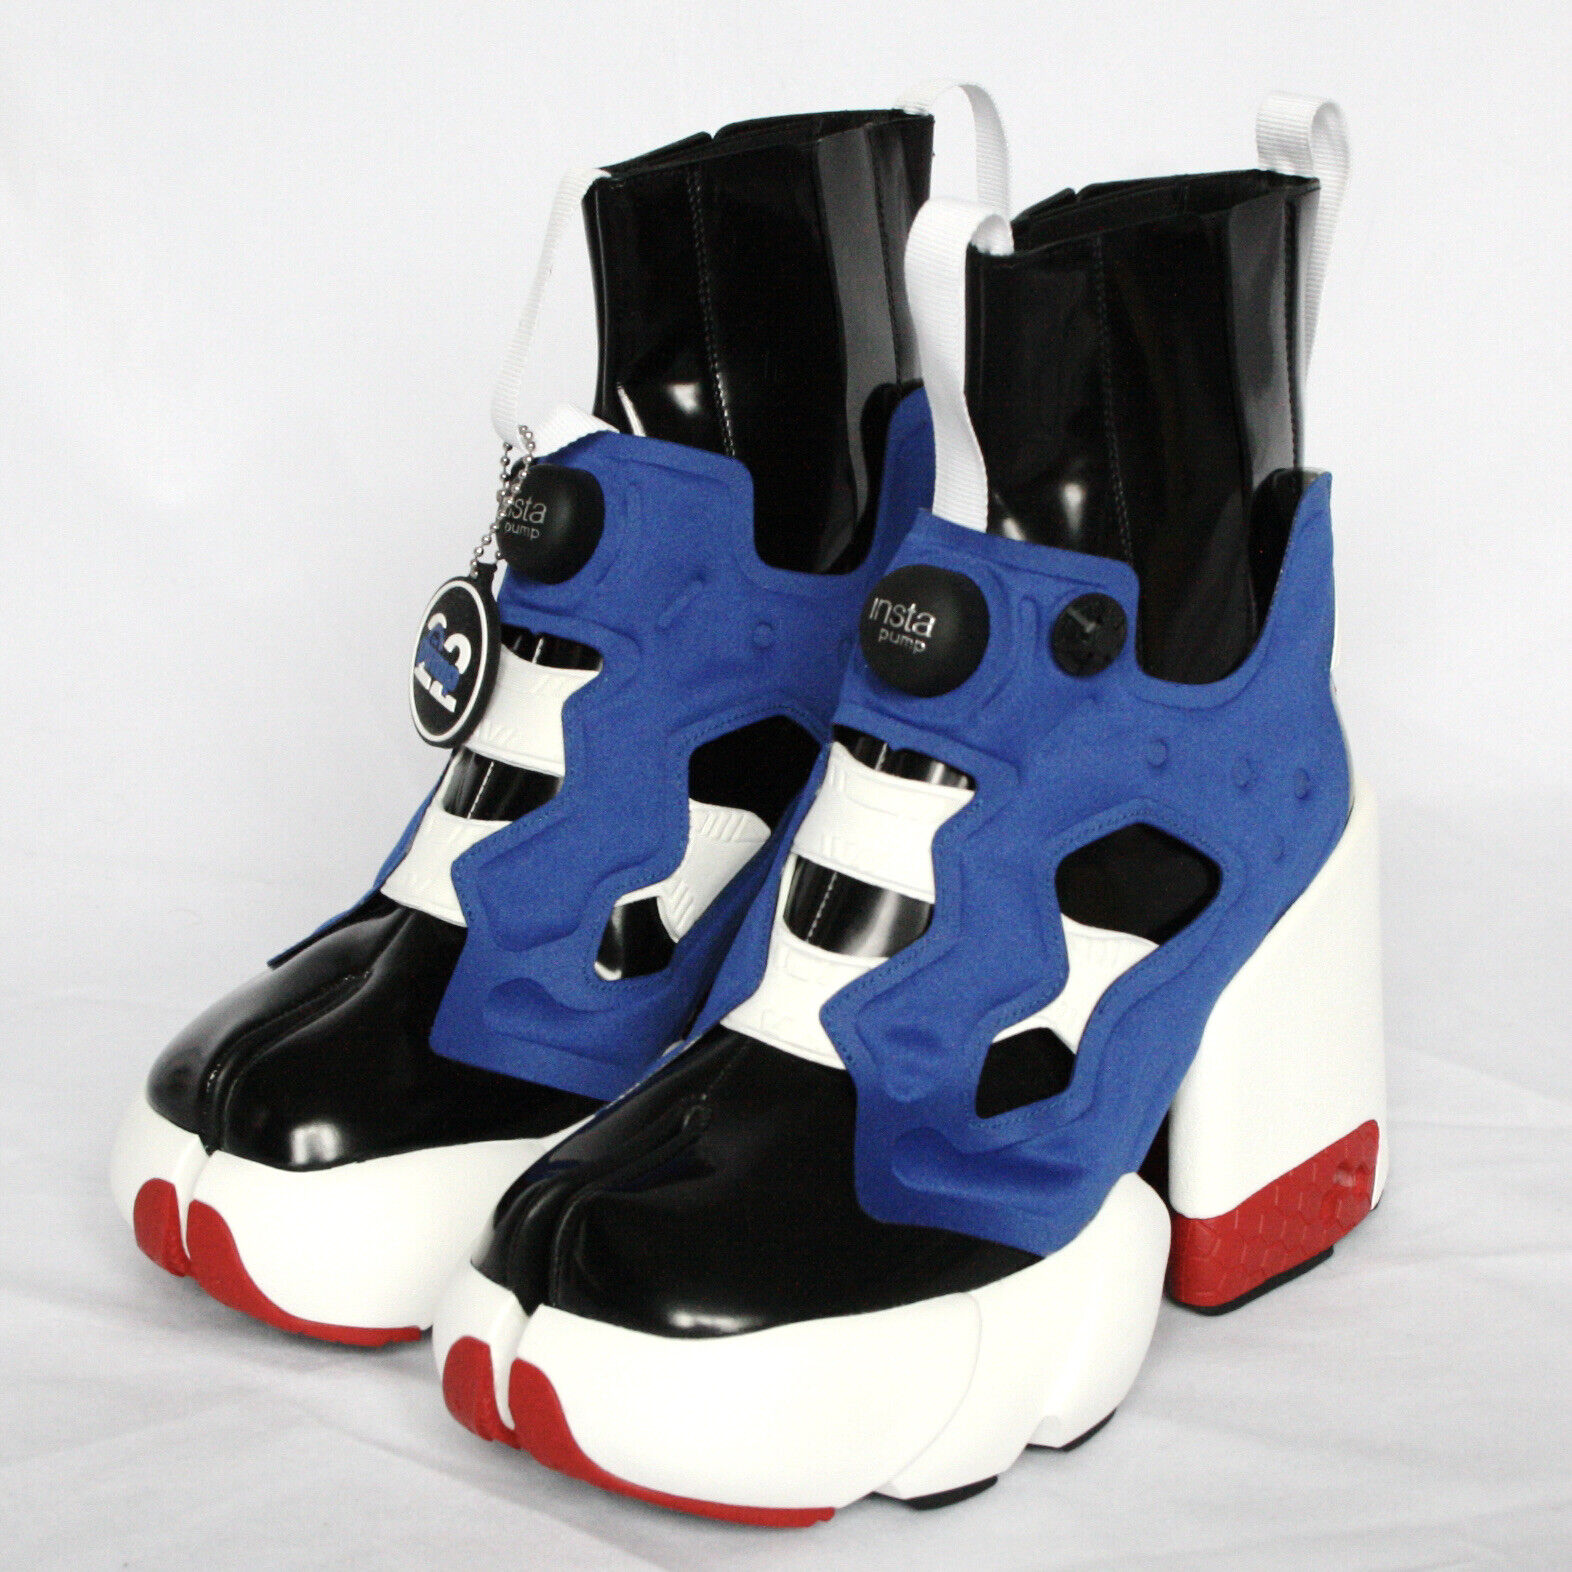 MAISON MARTIN MARGIELA x REEBOK Instapump Fury split toe tabi sneakers 37 NEW